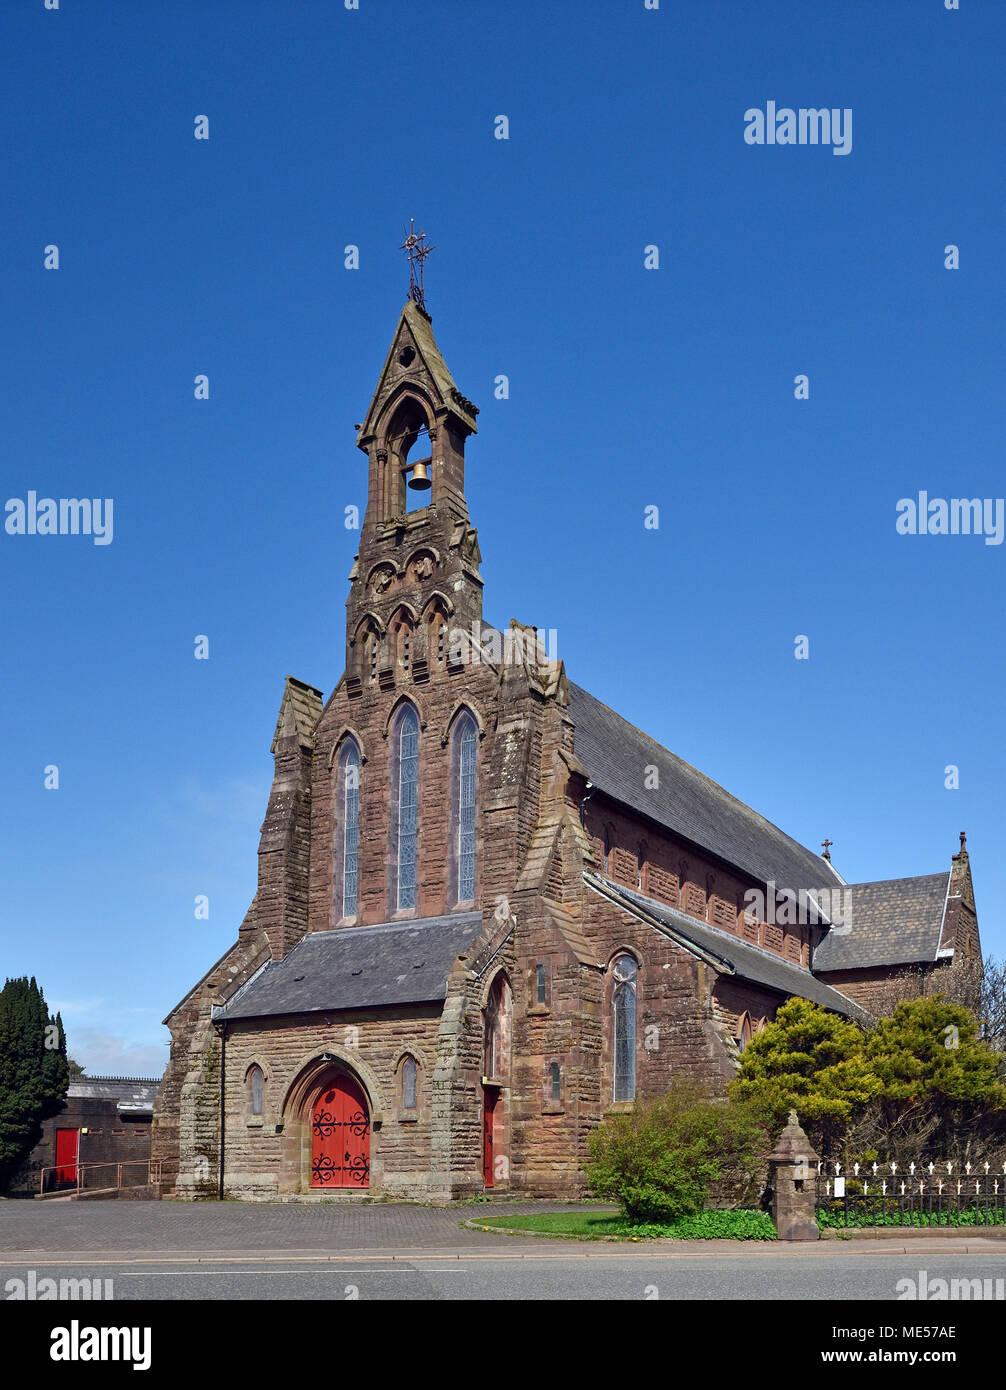 Church of Saint Mary (Roman Catholic). Cleator, Cumbria, England, United Kingdom, Europe. - Stock Image